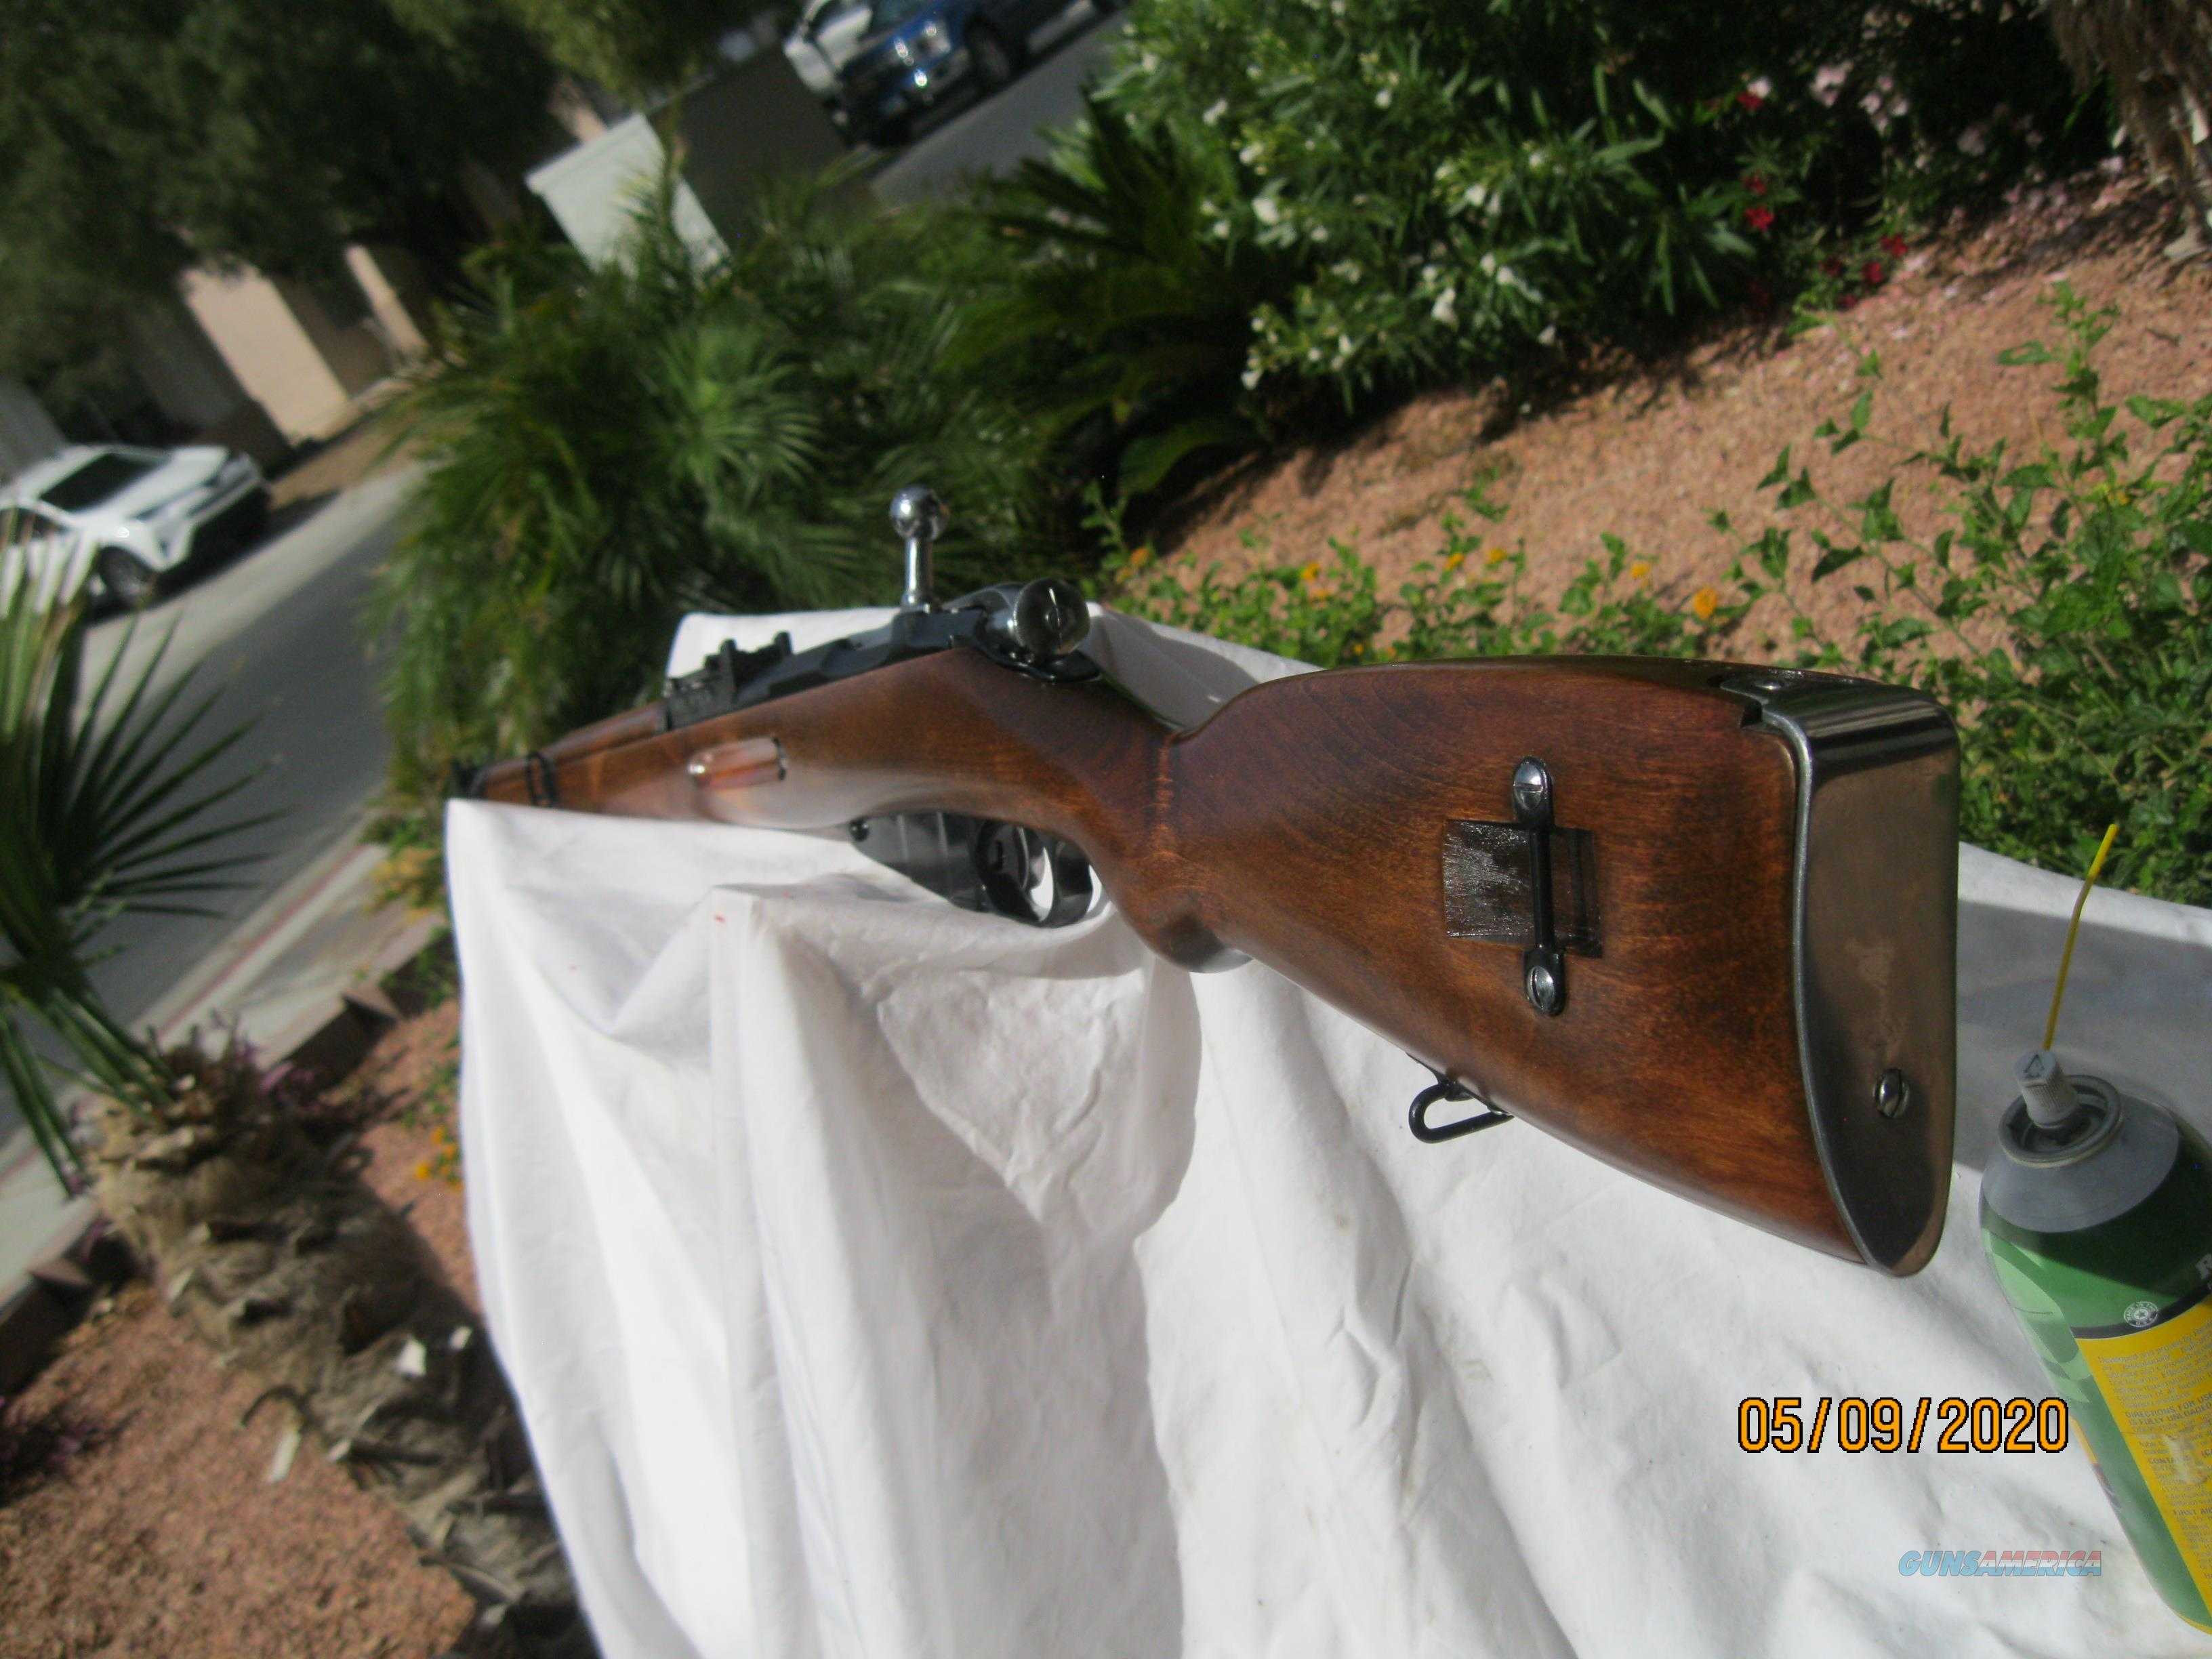 FINNISH WW 2 M-39 MOSIN-NAGANT  Guns > Rifles > Military Misc. Rifles Non-US > Other